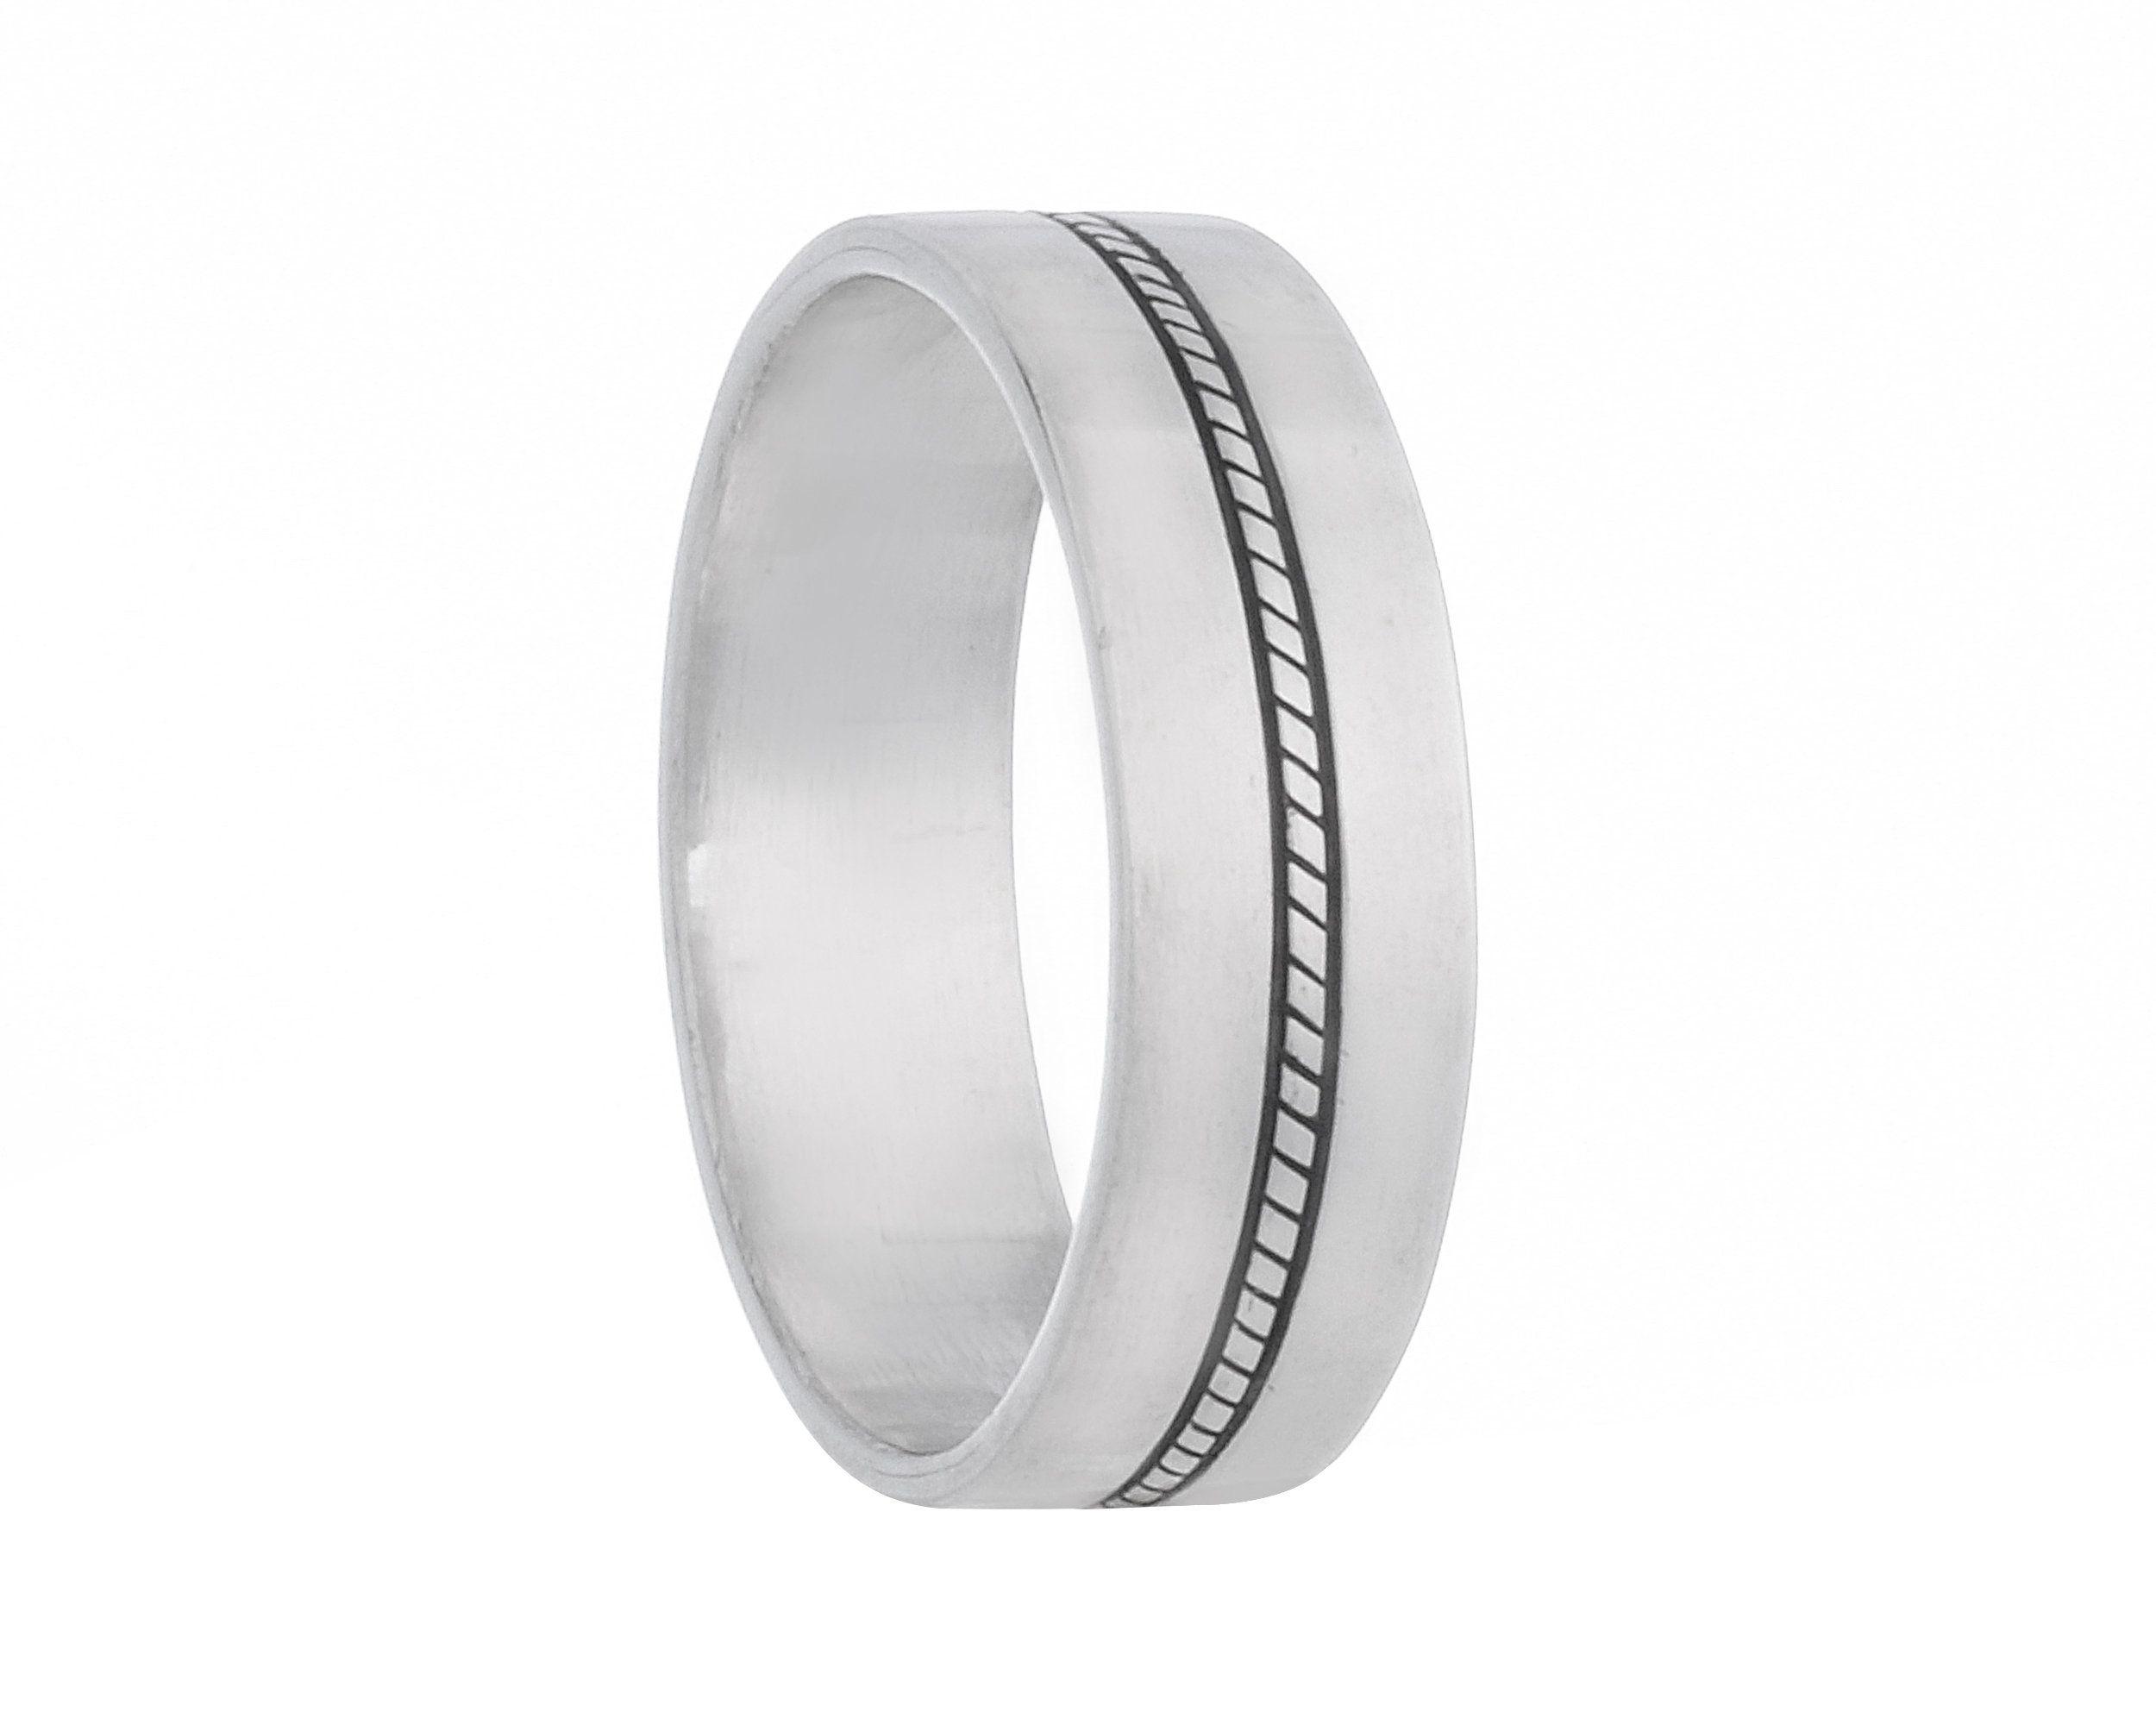 Men S Wedding Band 925 Sterling Silver Men S Ring Etsy In 2021 Silver Wedding Bands Sterling Silver Wedding Band Rings For Men